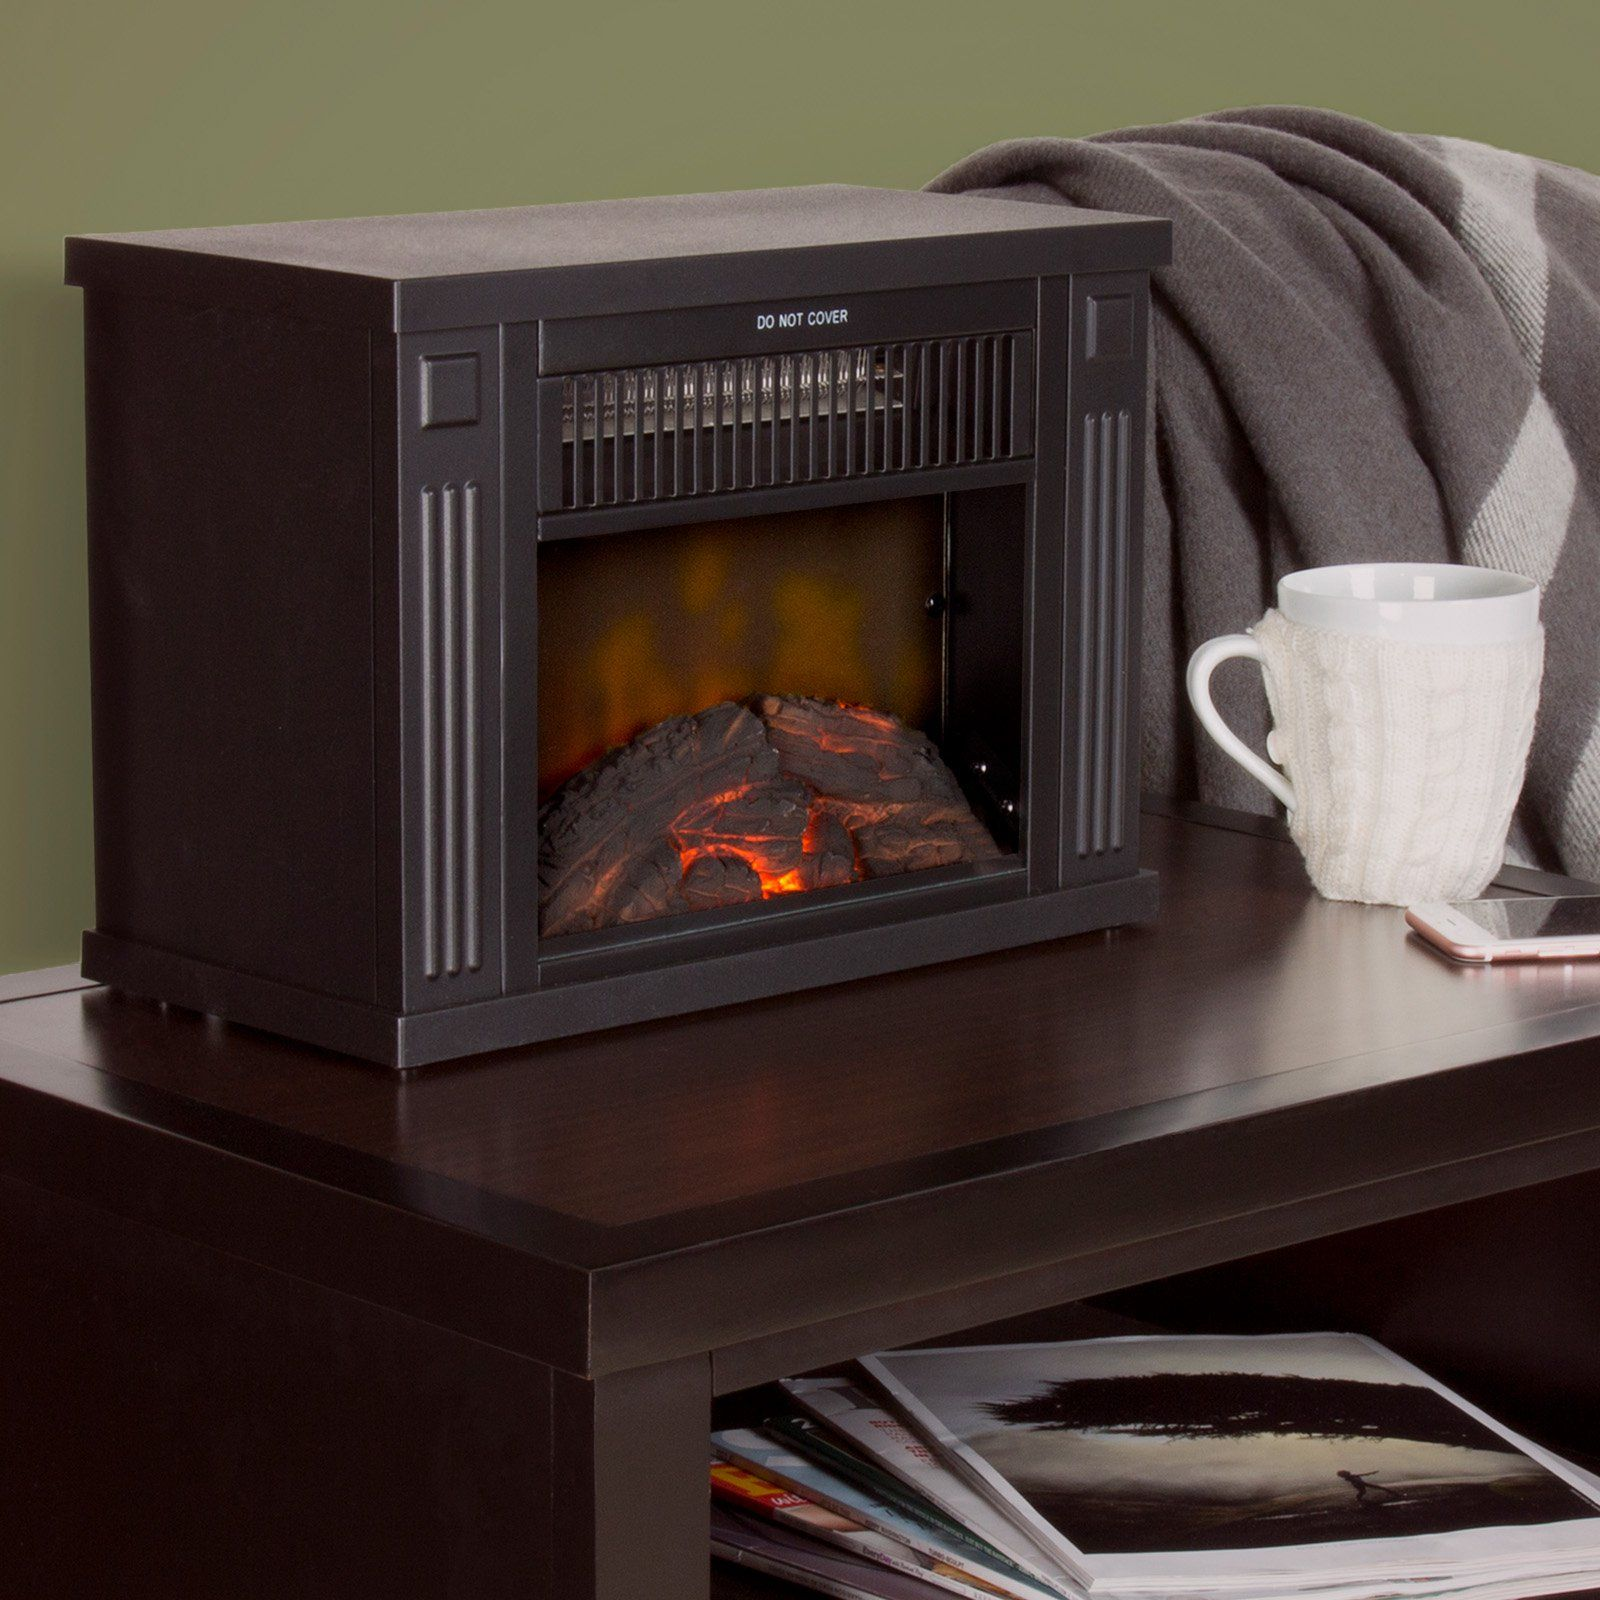 Northwest Portable Mini Electric Fireplace Heater 80 Ef480 B